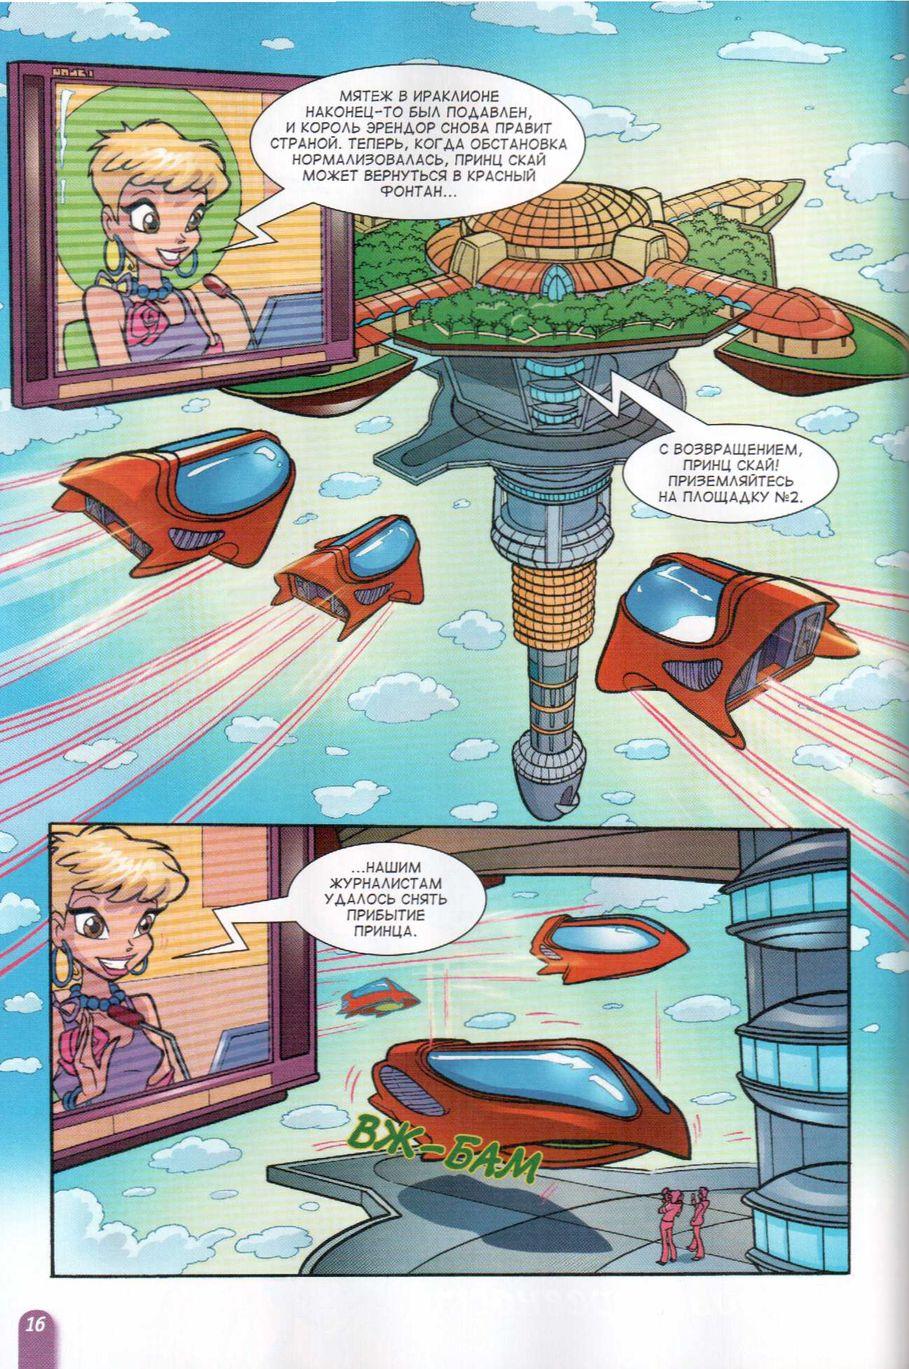 Комикс Винкс Winx - Любовь и ревность (Журнал Винкс №7 2011) - стр. 16